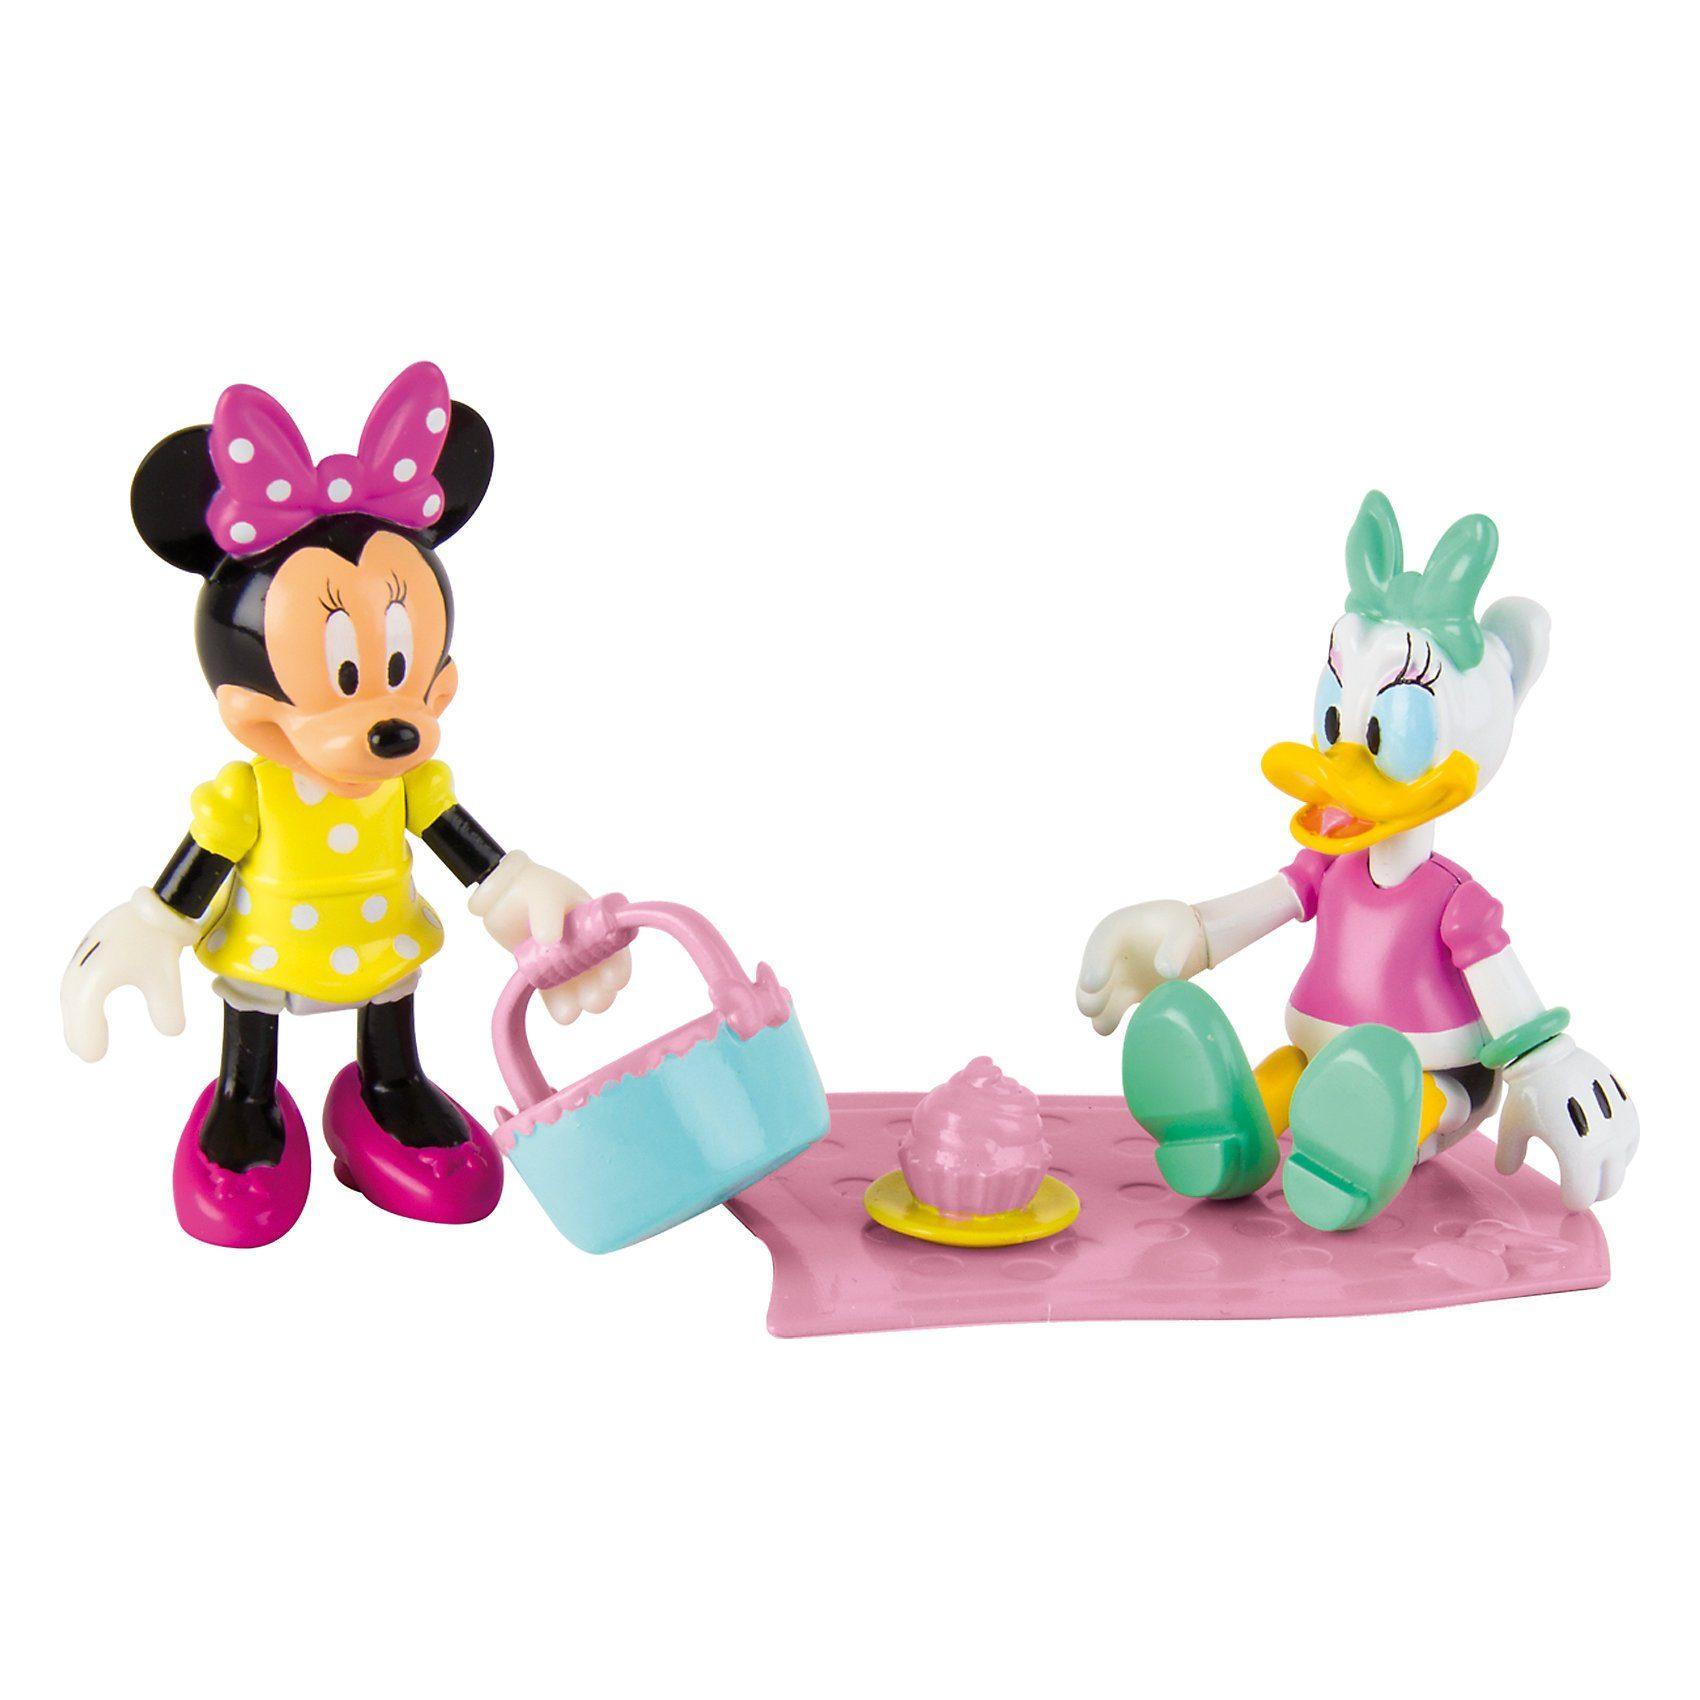 IMC TOYS Minnie und Daisys Picknick Set